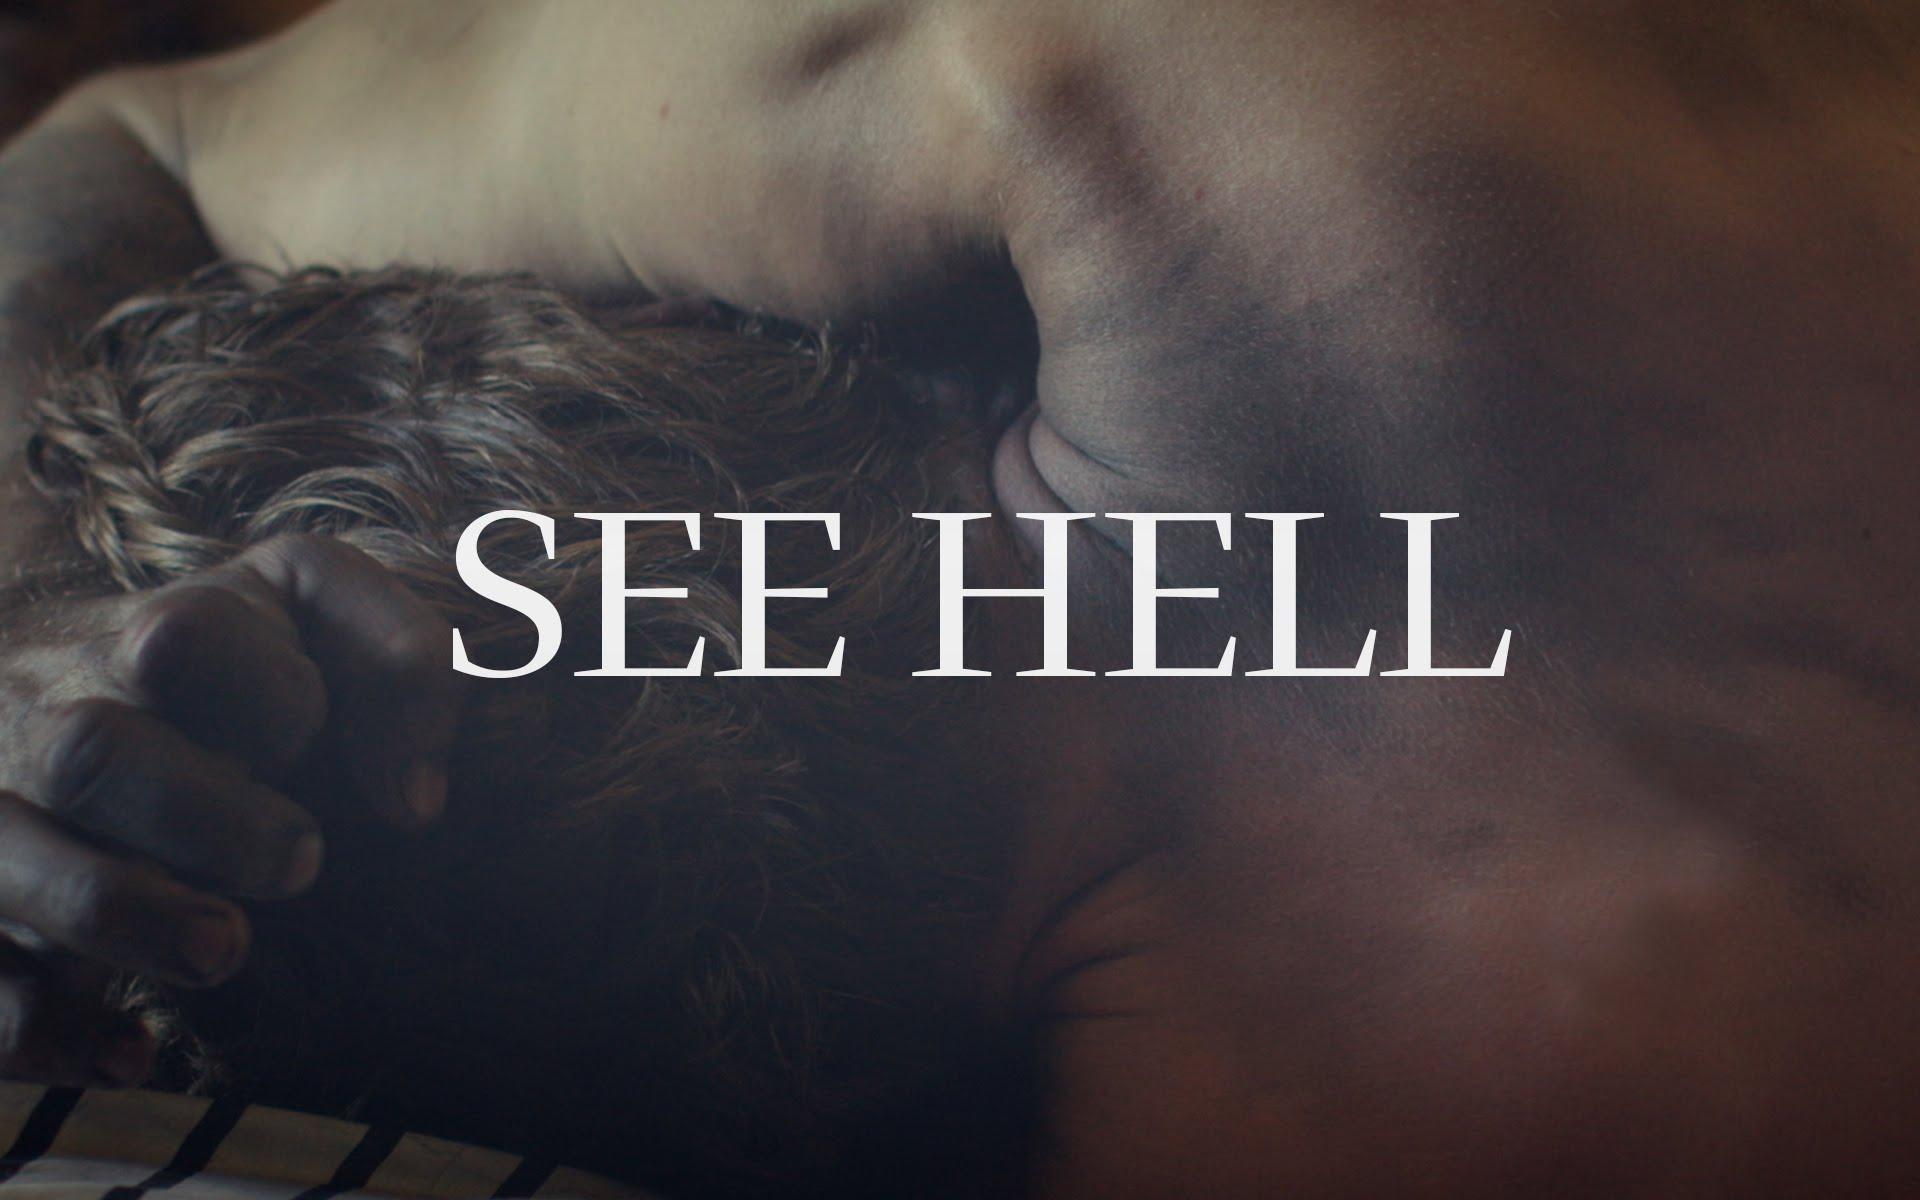 See hell.jpg